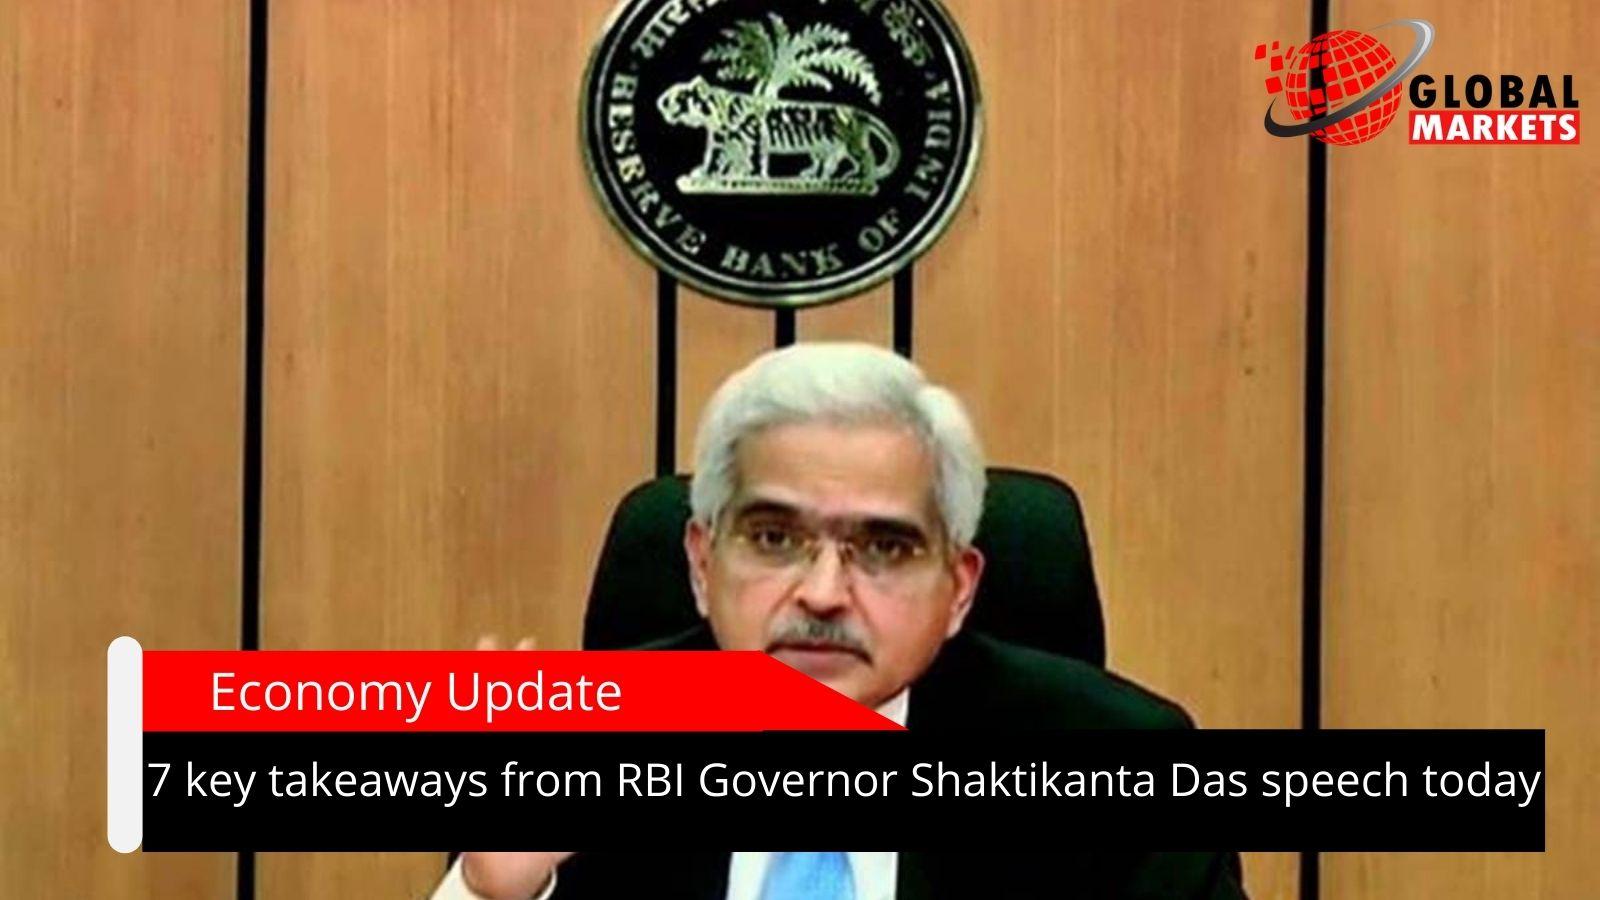 7 key takeaways from RBI Governor Shaktikanta Das speech today